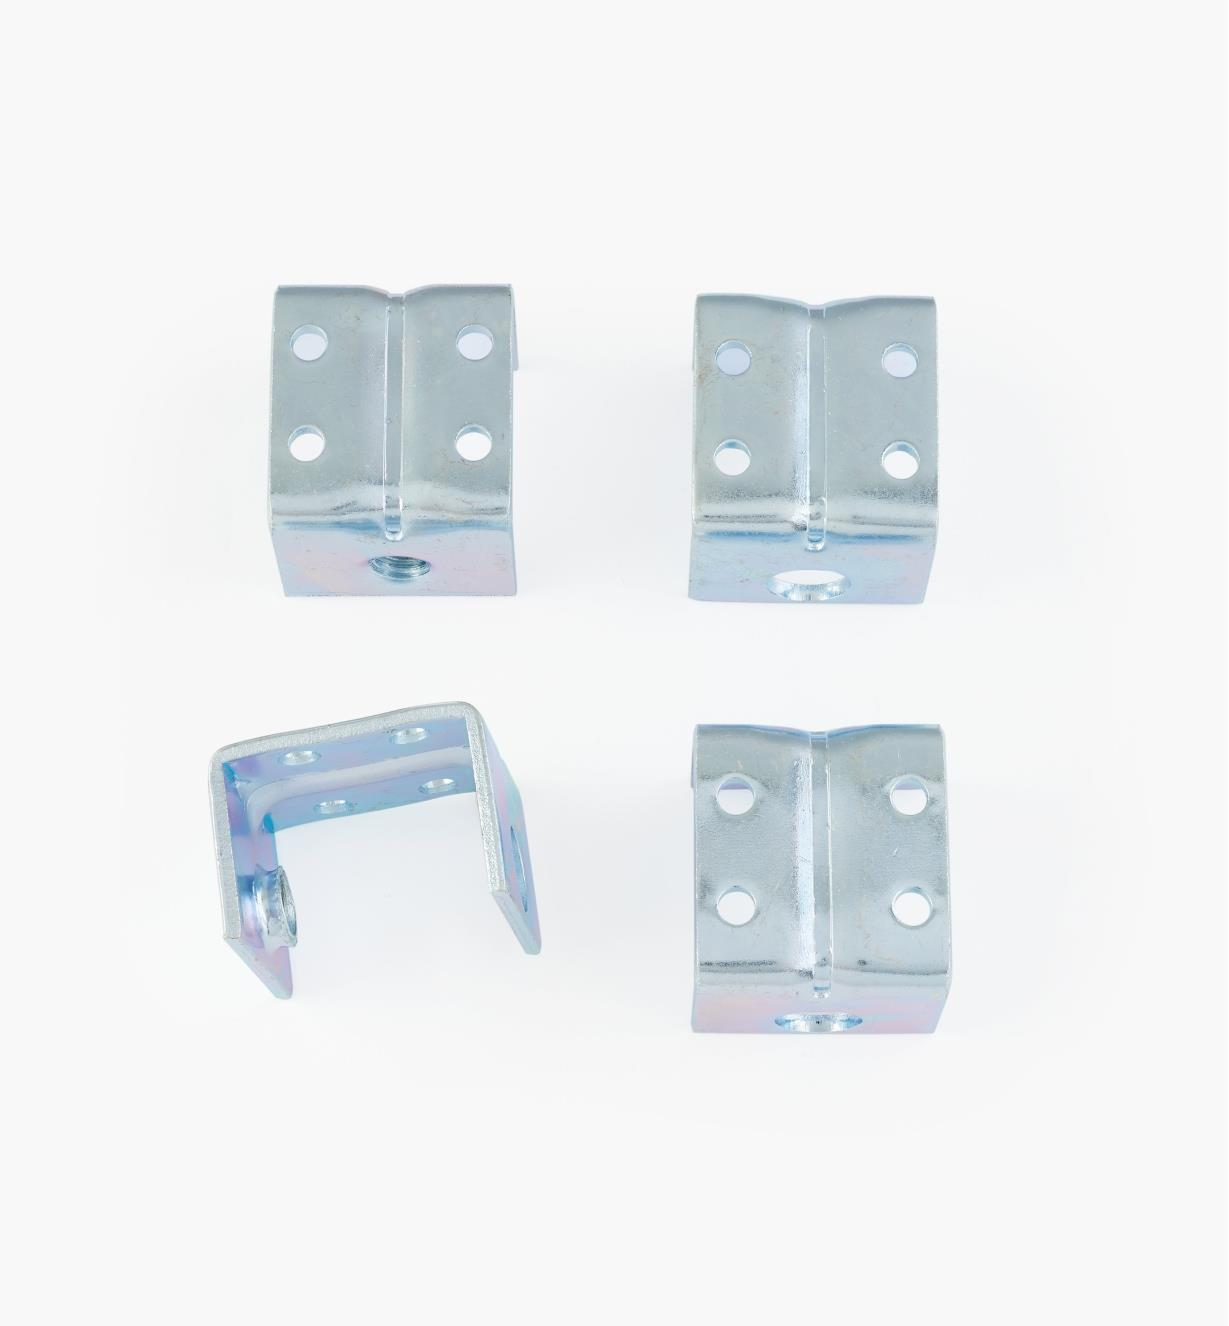 01S0405 - Panel Brackets, pkg. of 4